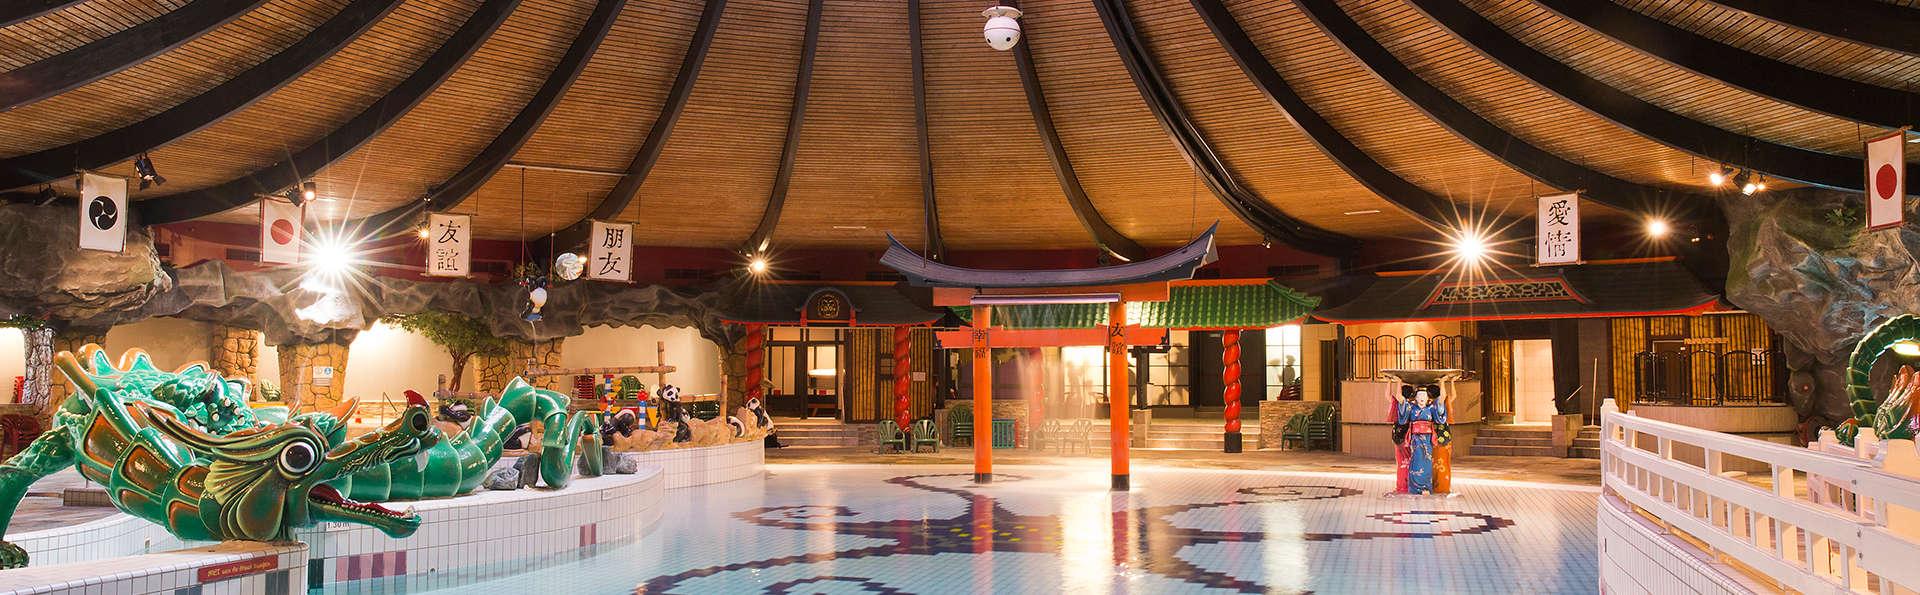 Hotel De Bonte Wever Assen - edit_swimmingpool.jpg